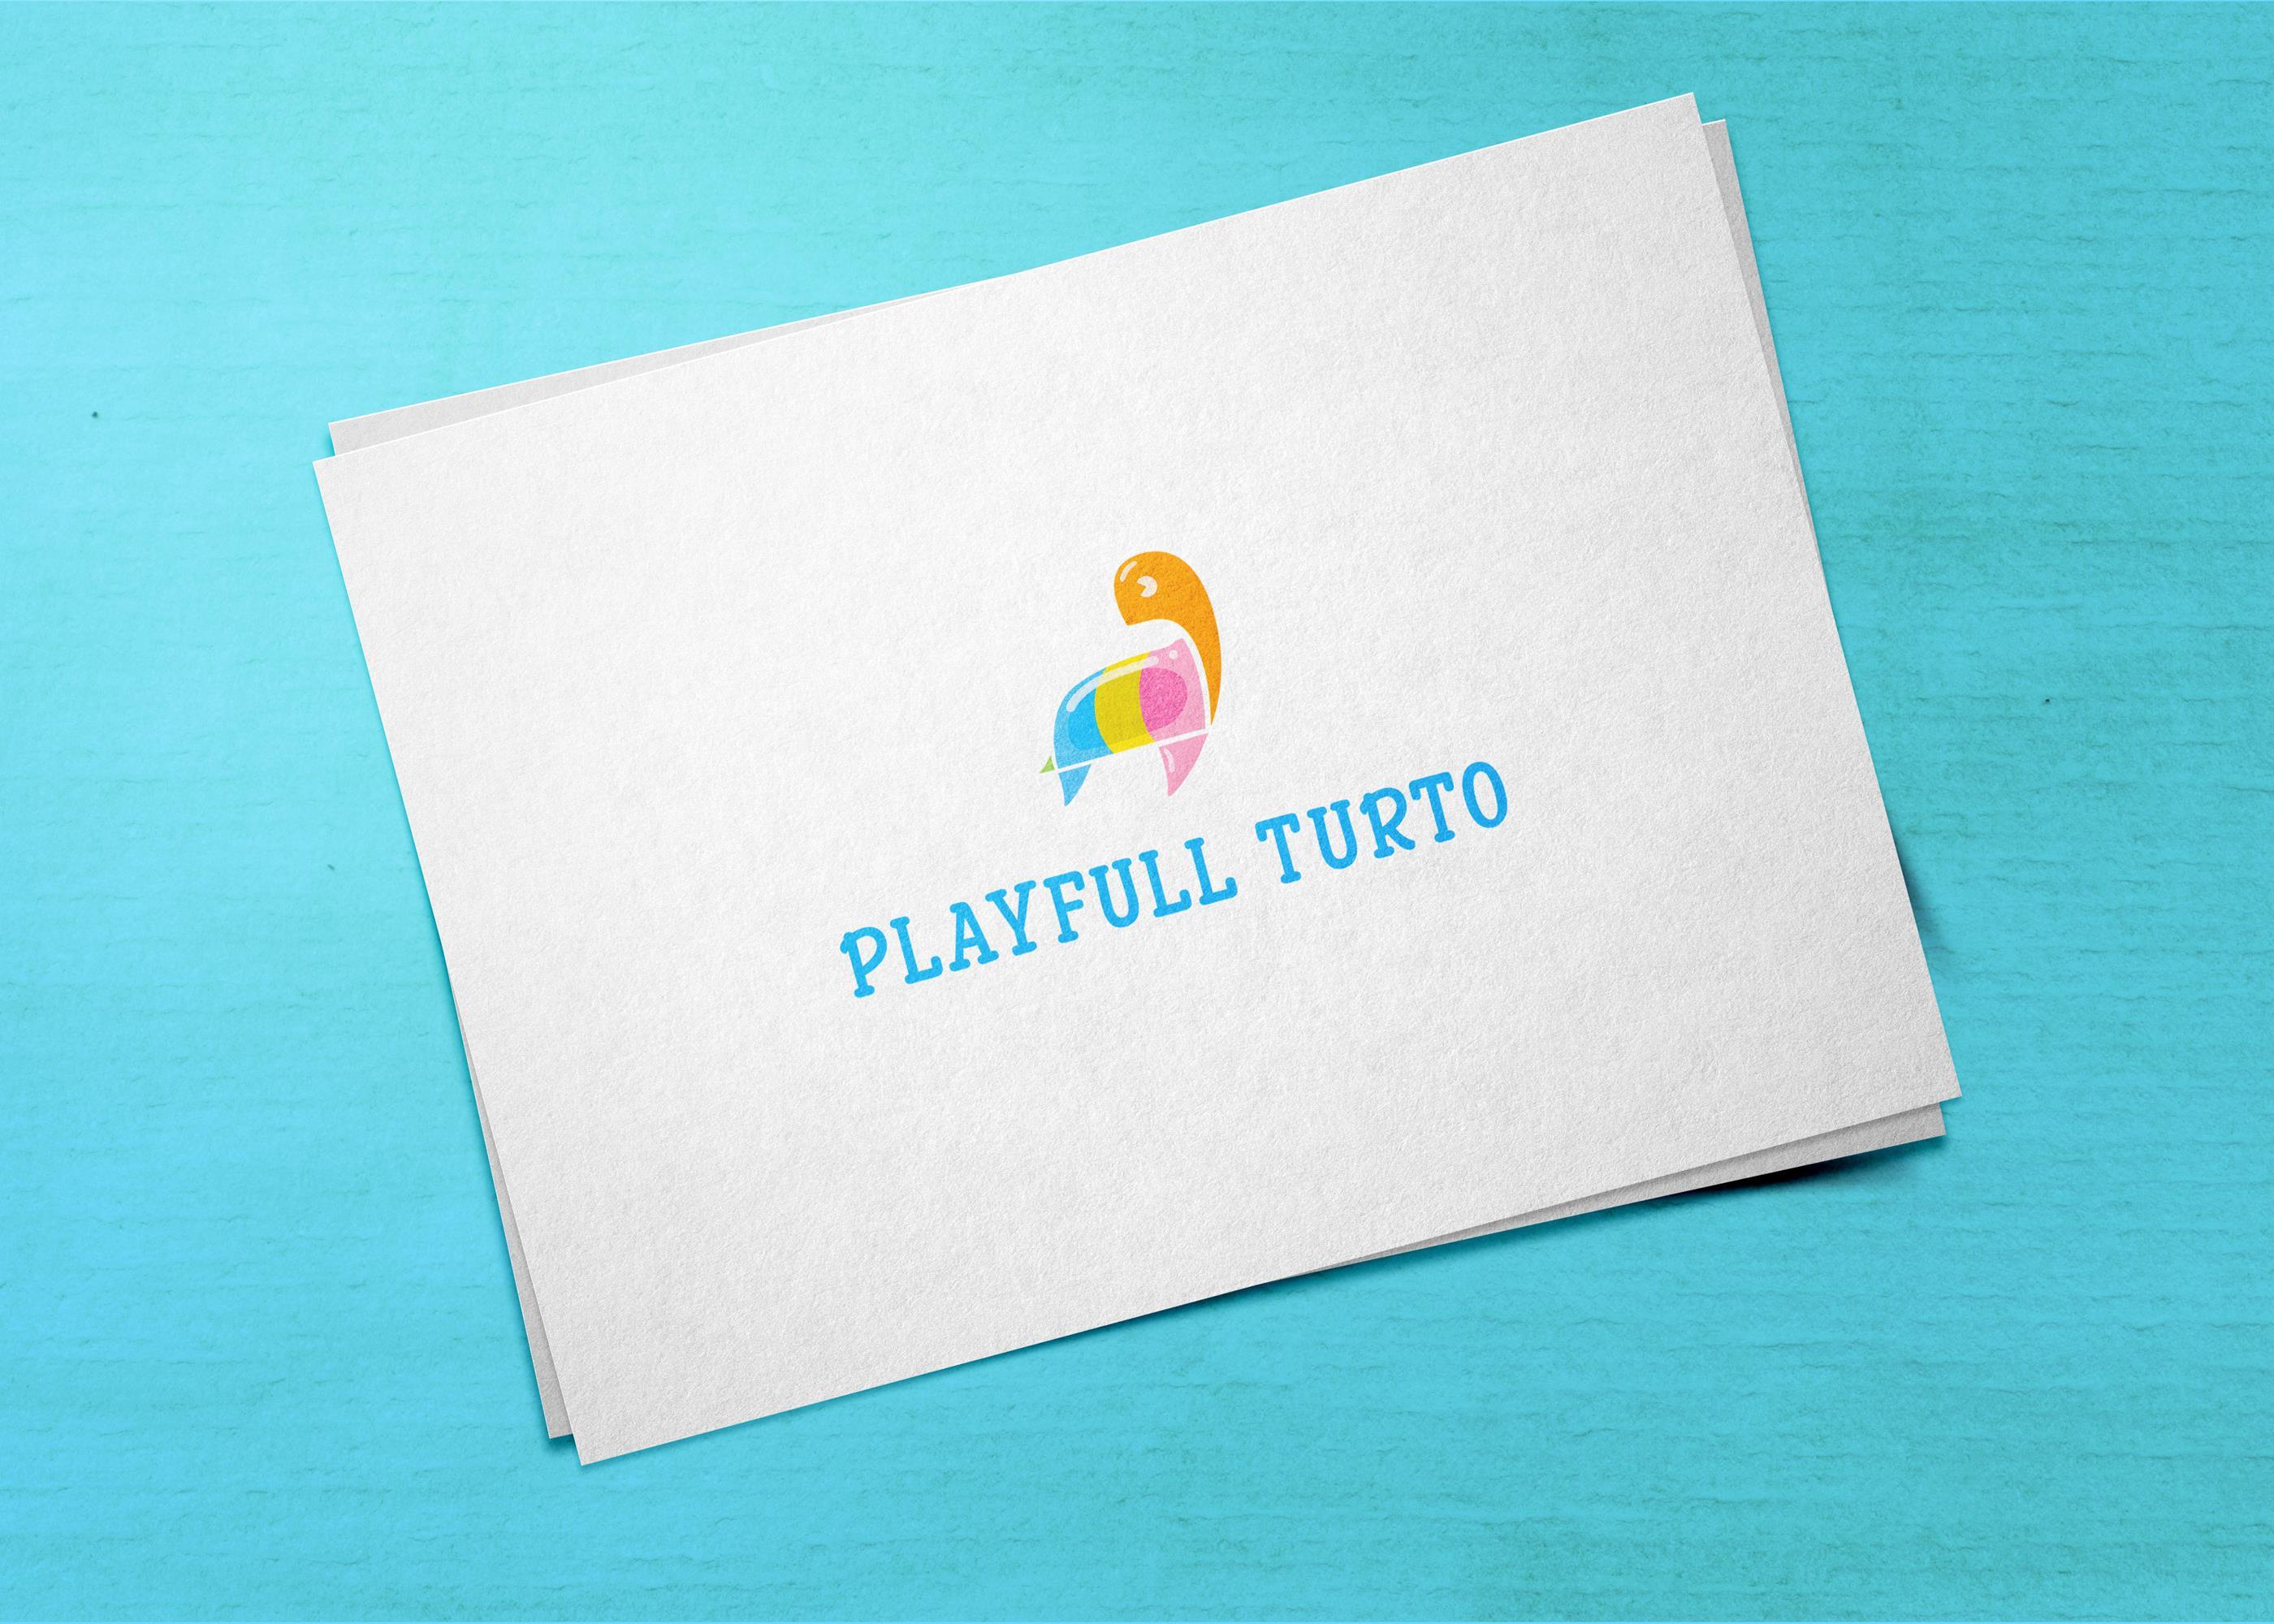 Playfull Turto